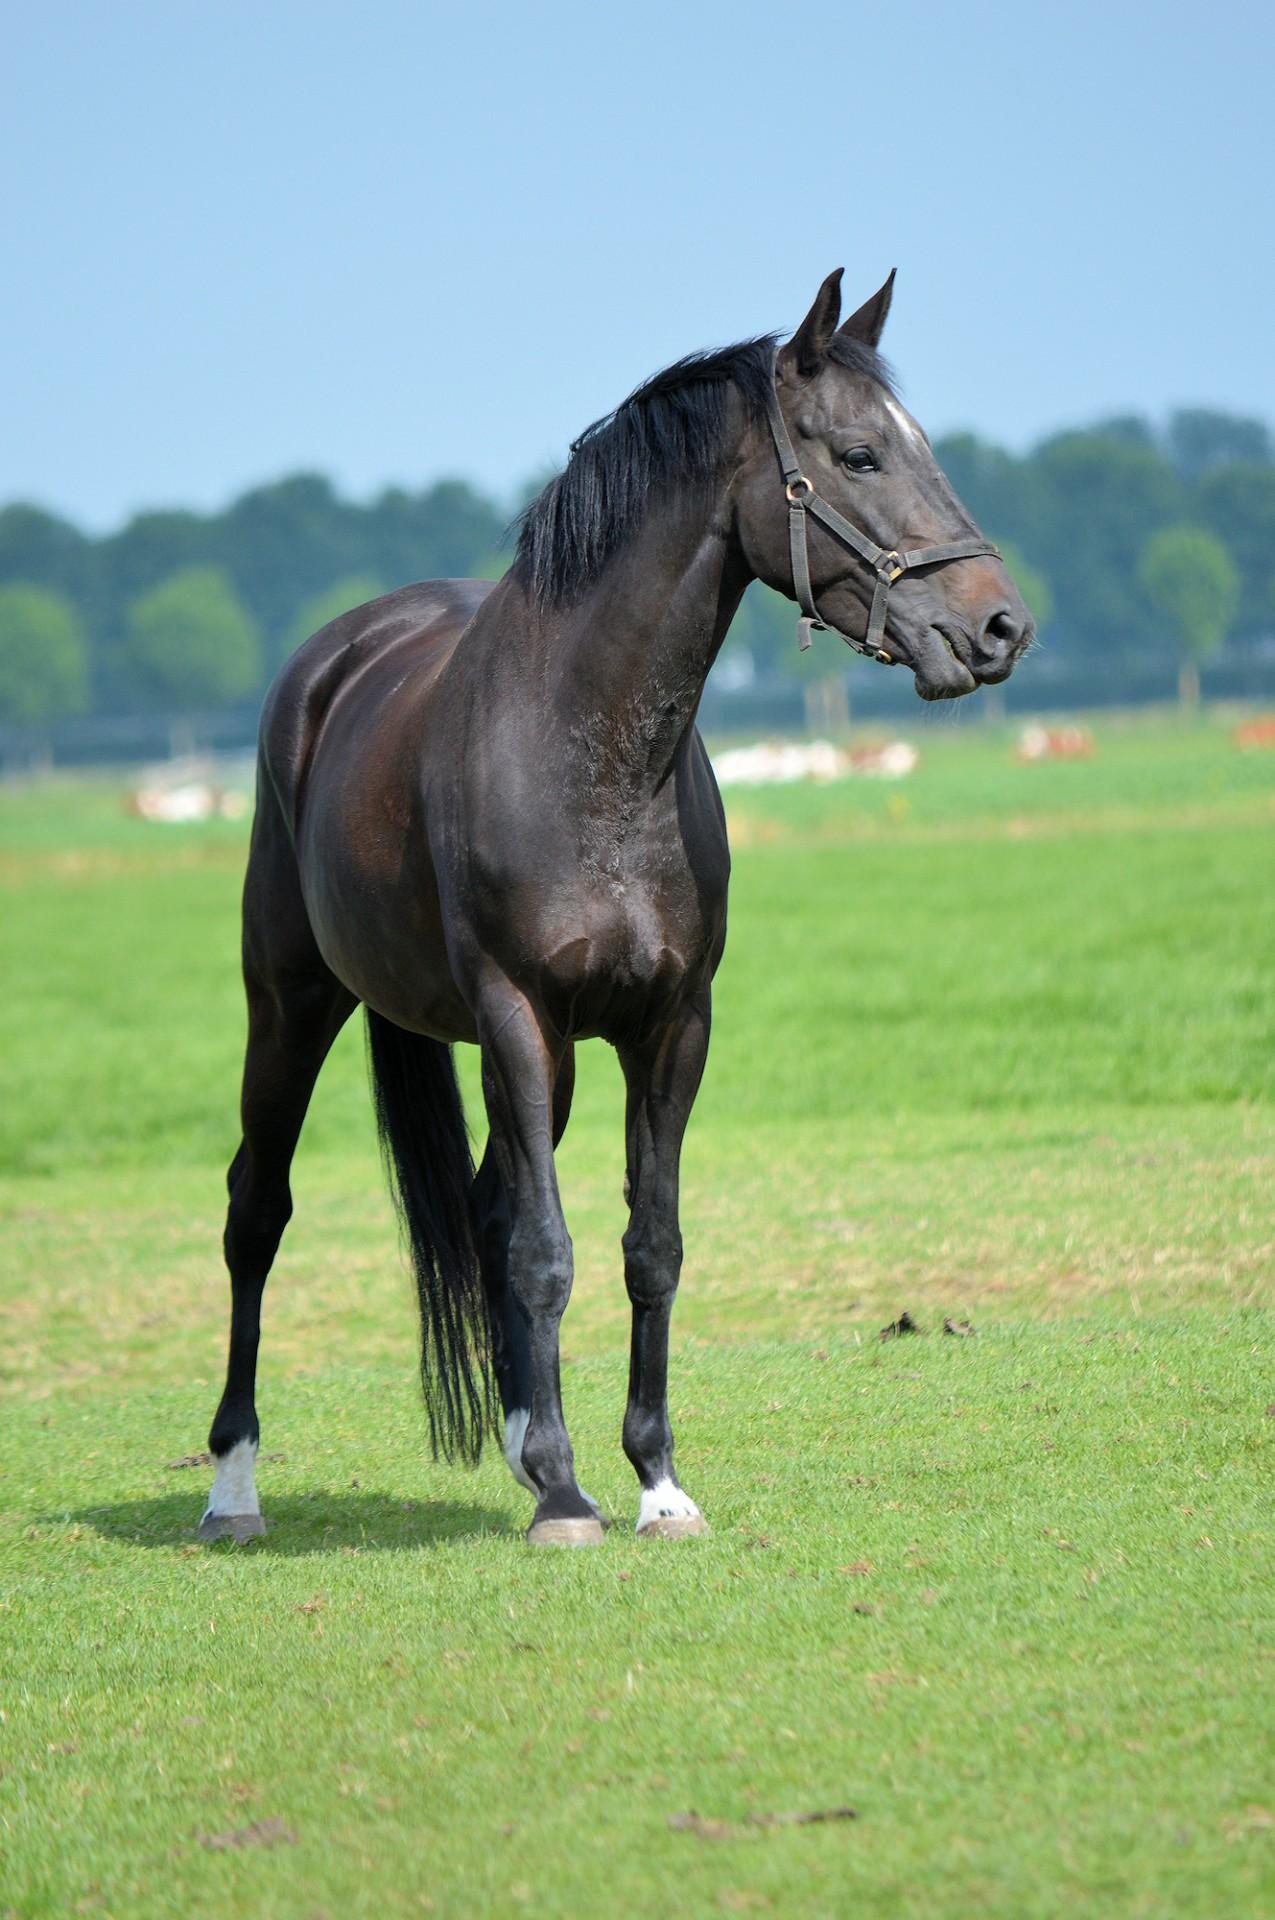 black horse free stock photo - public domain pictures